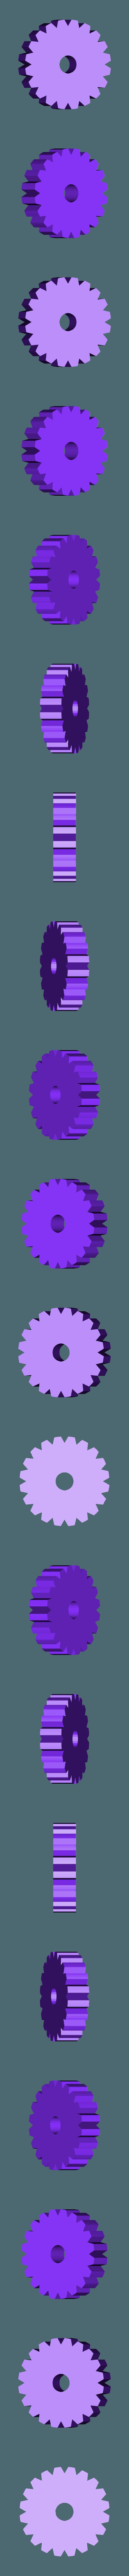 BloccoRegolazione_Z.stl Download free STL file Alfawise U30 Z Stop • Model to 3D print, Scigola